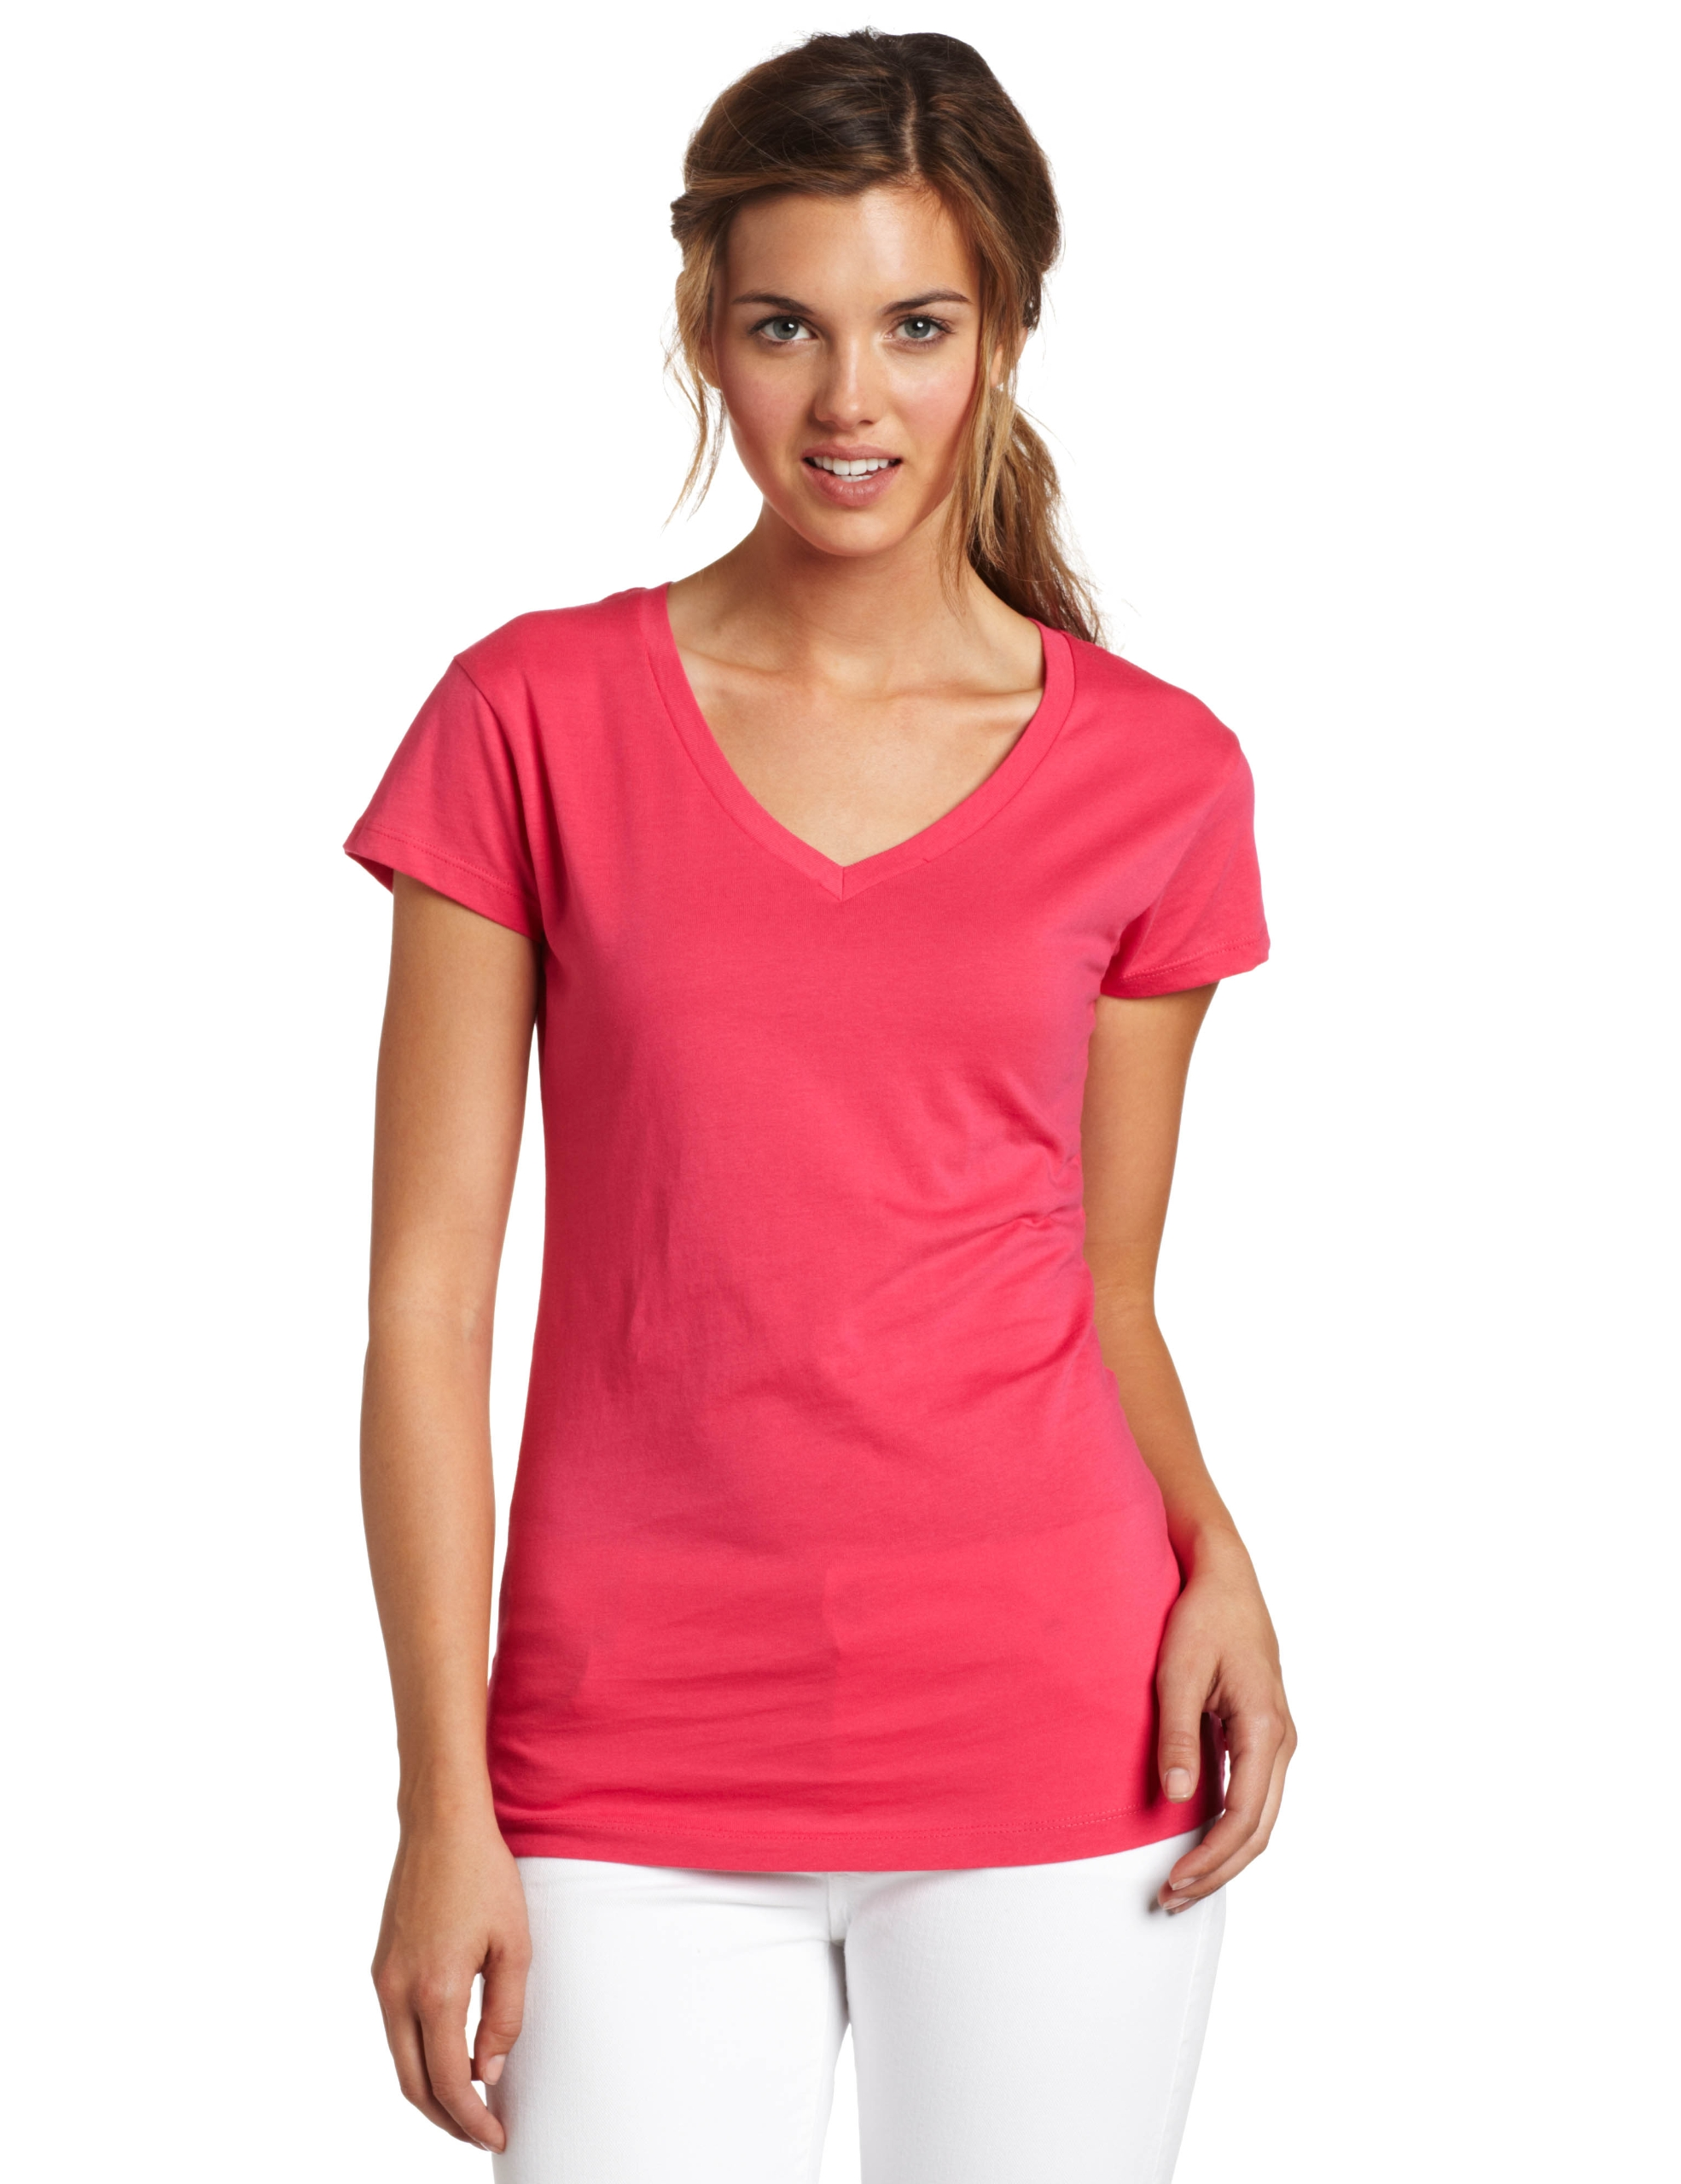 Dickies Girl Juniors Short Sleeve V-Neck Tee,Lipstick Pink,Small